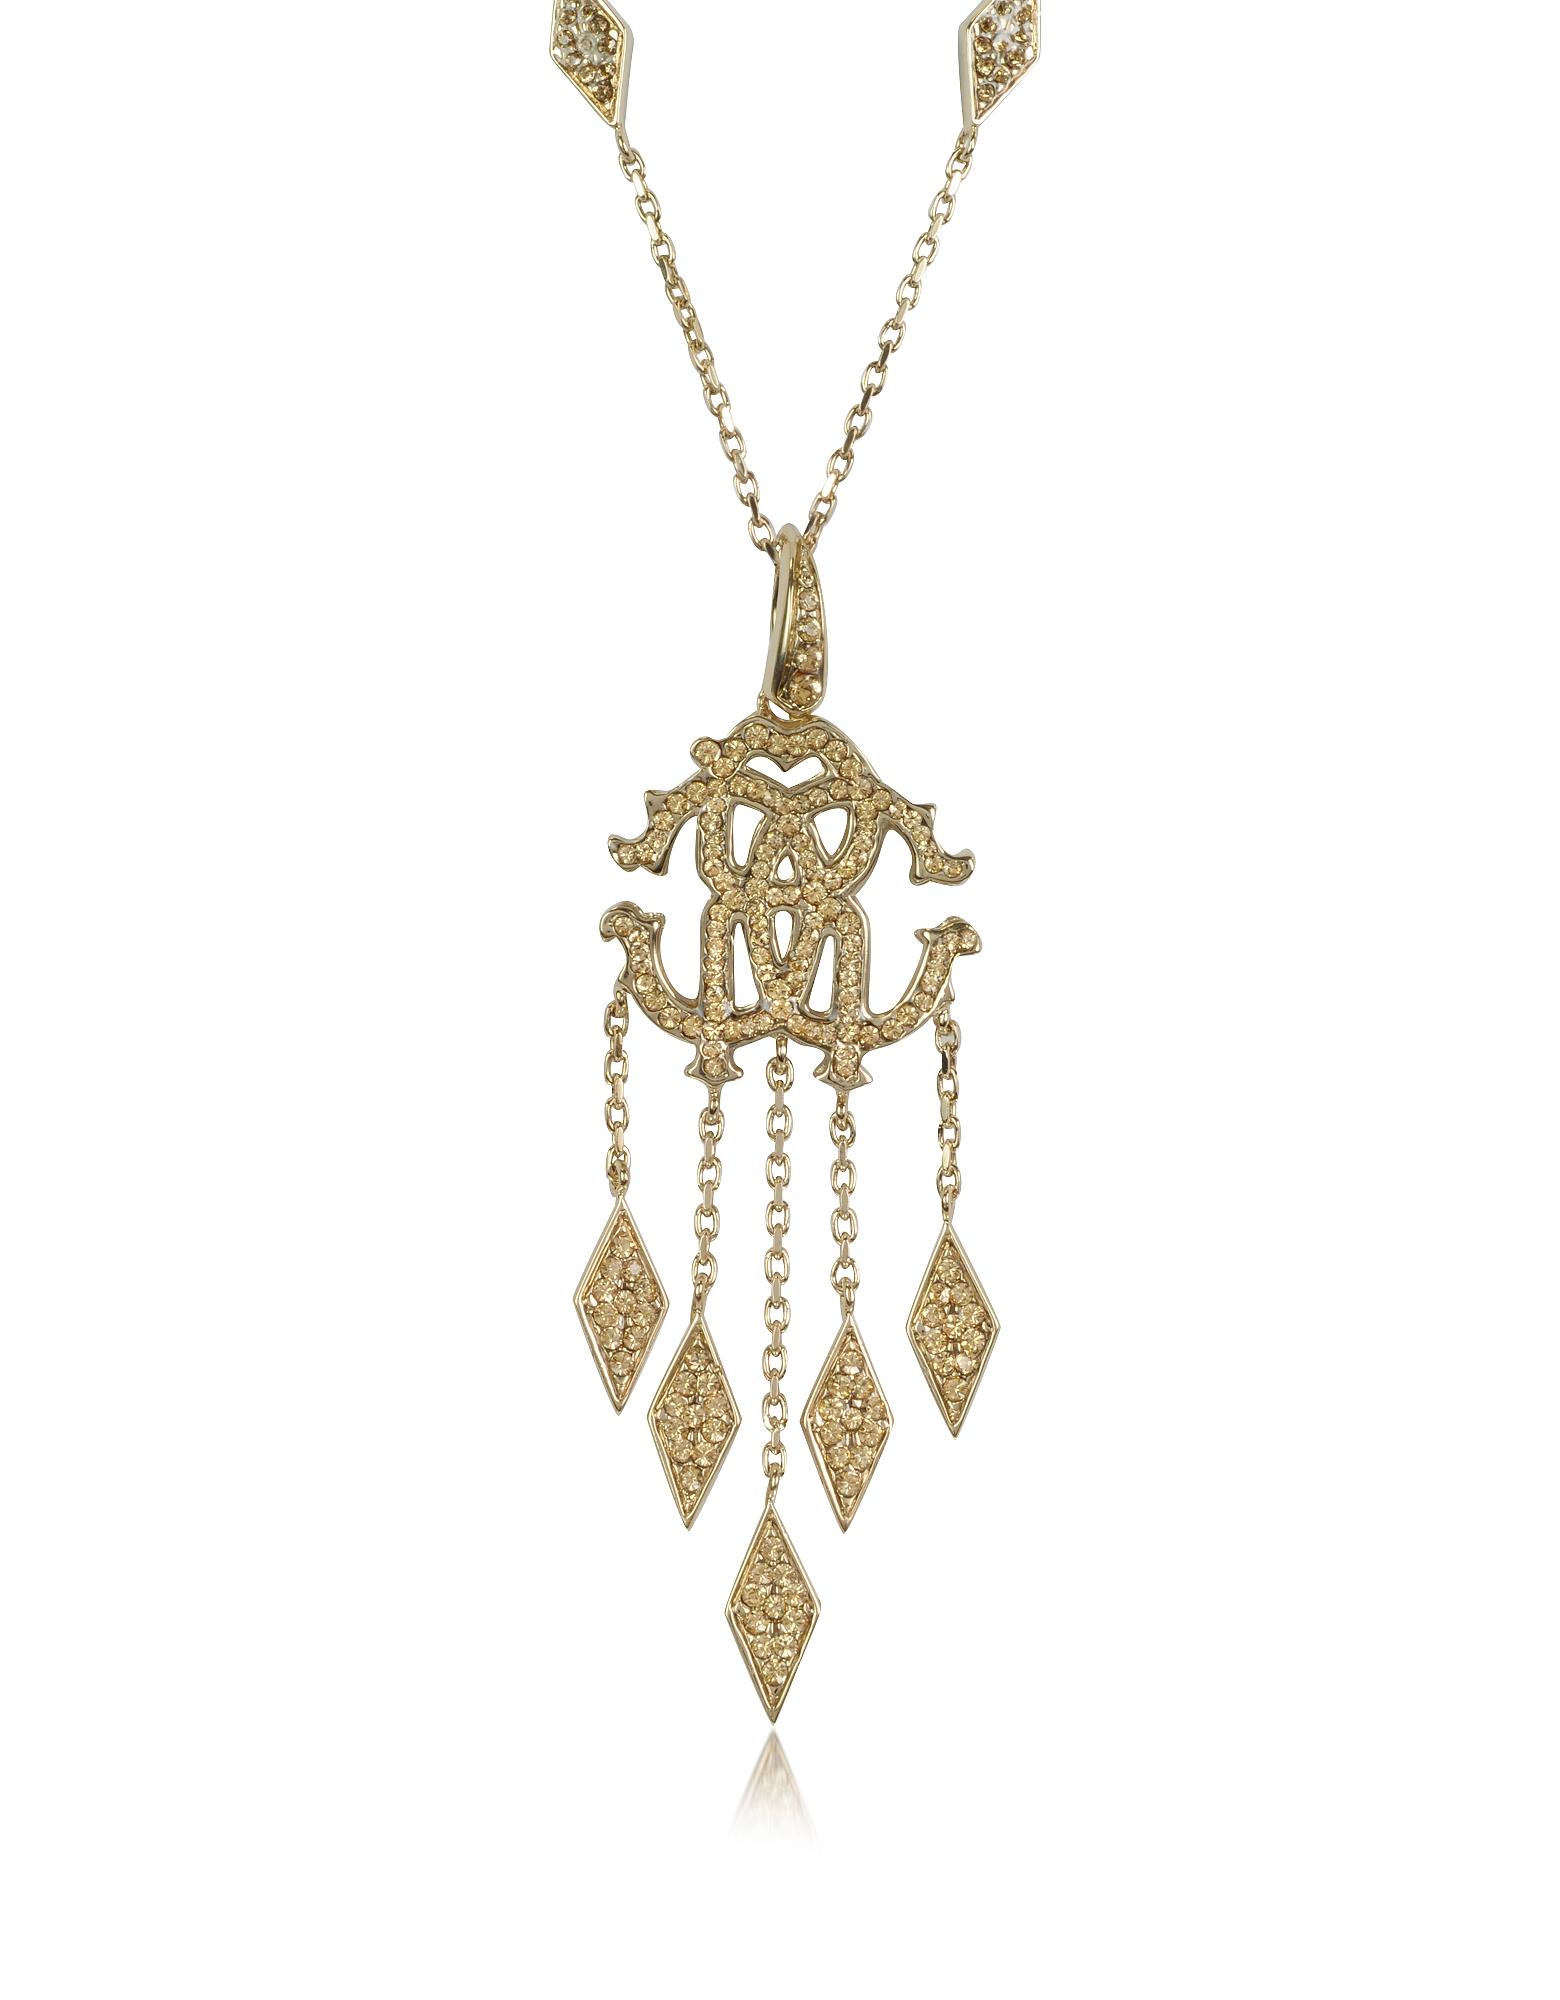 Roberto Cavalli RC Luxe - Ожерелье с Подвеской из Металла с Кристаллами